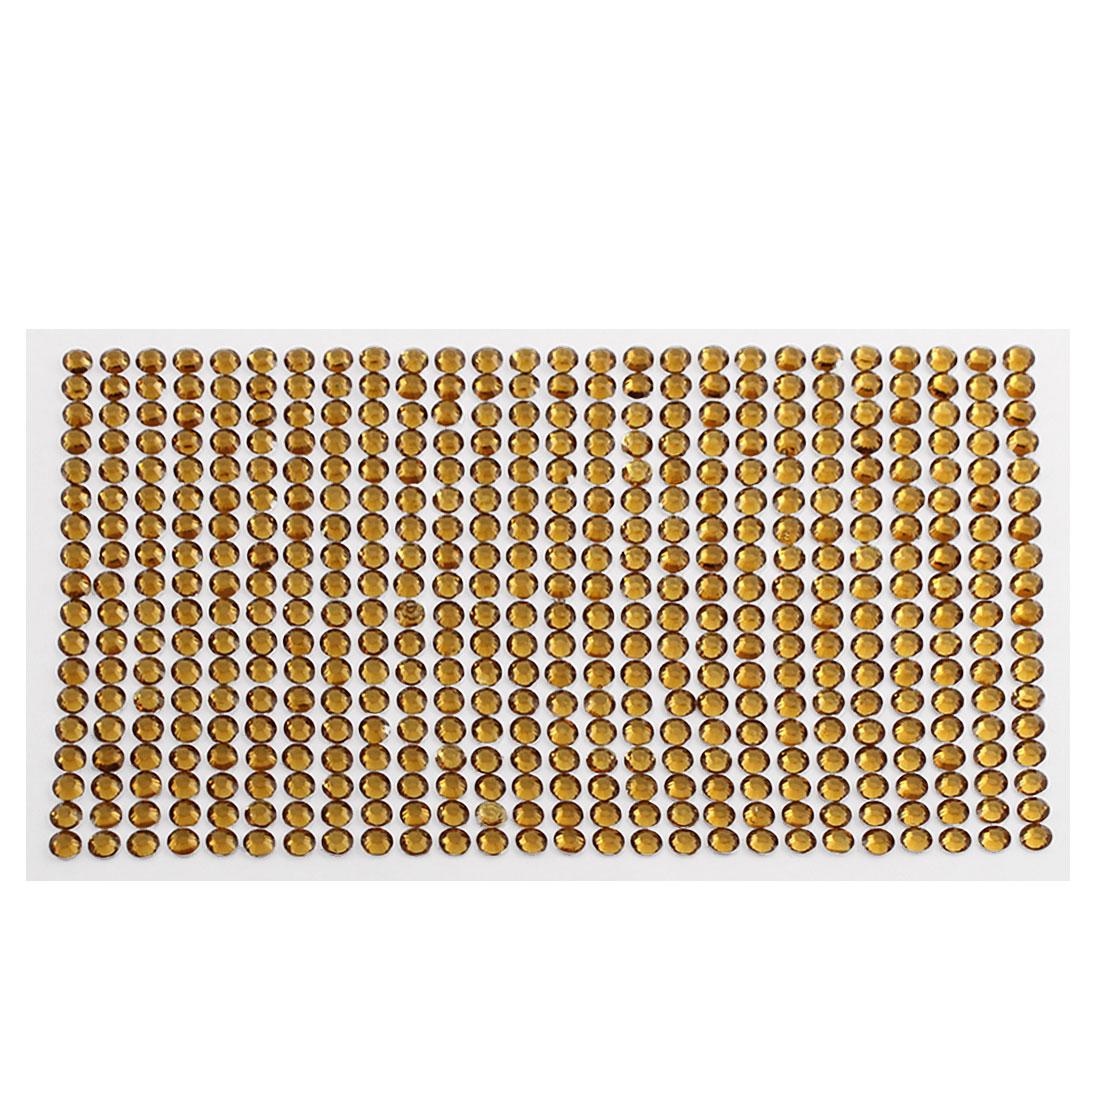 Dark Brown 5mm Round Self Adhesive Bling Crystal Rhinestone Decorating Stickers